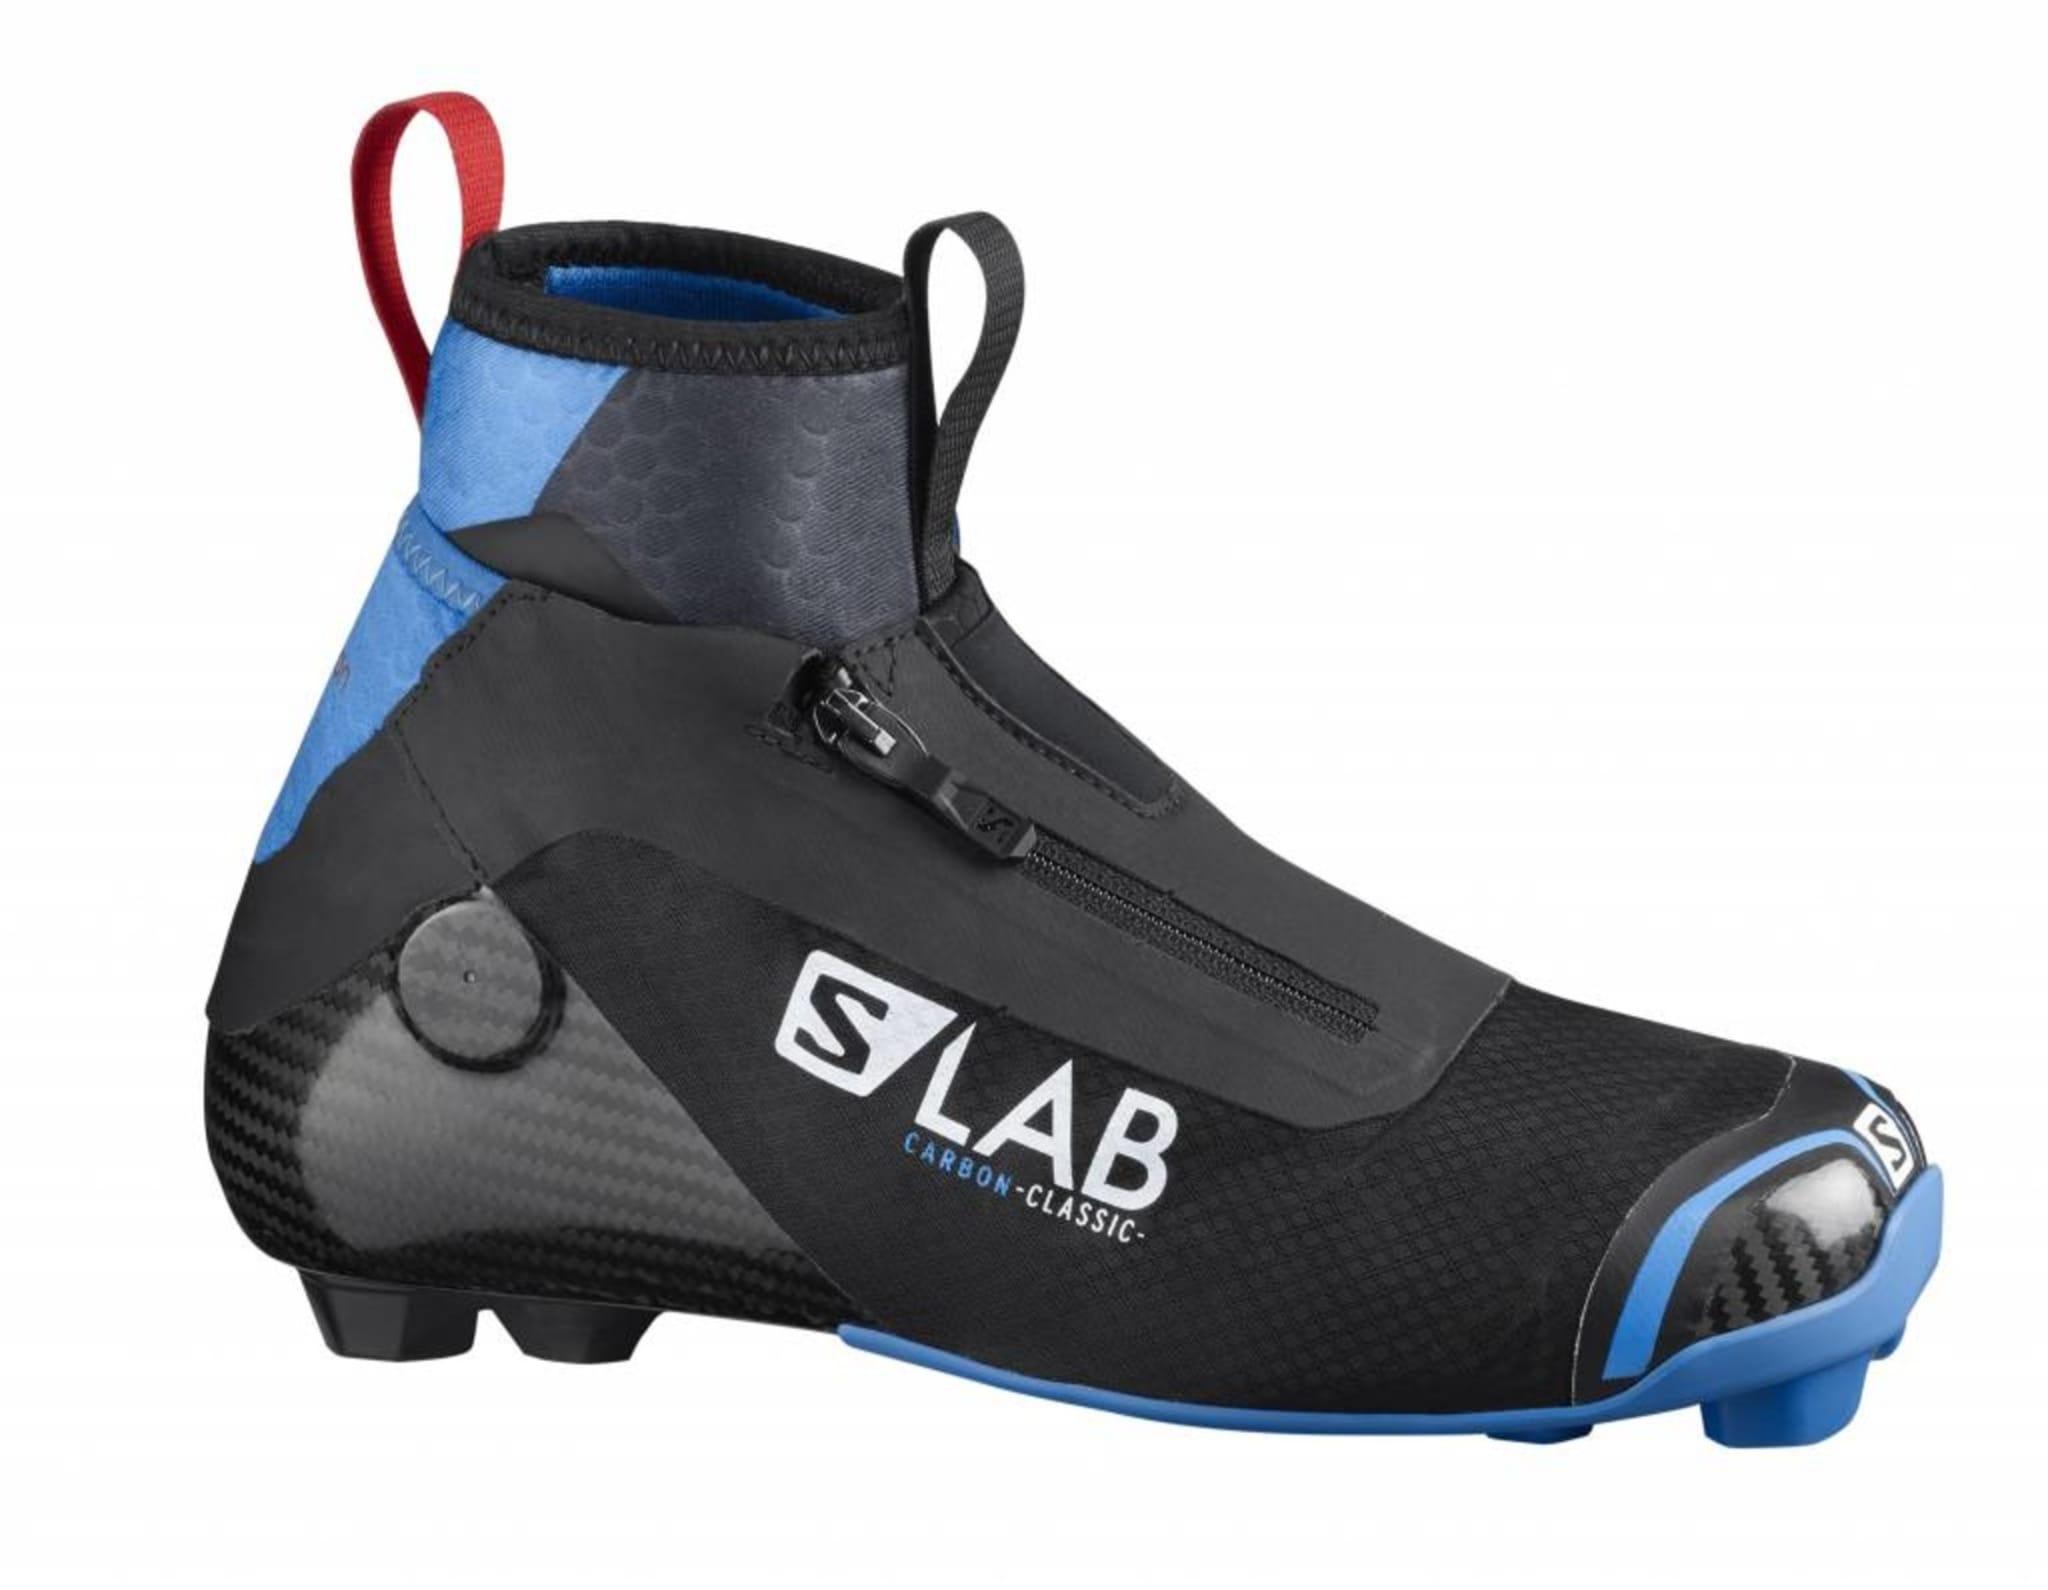 S/LAB Carbon Classic